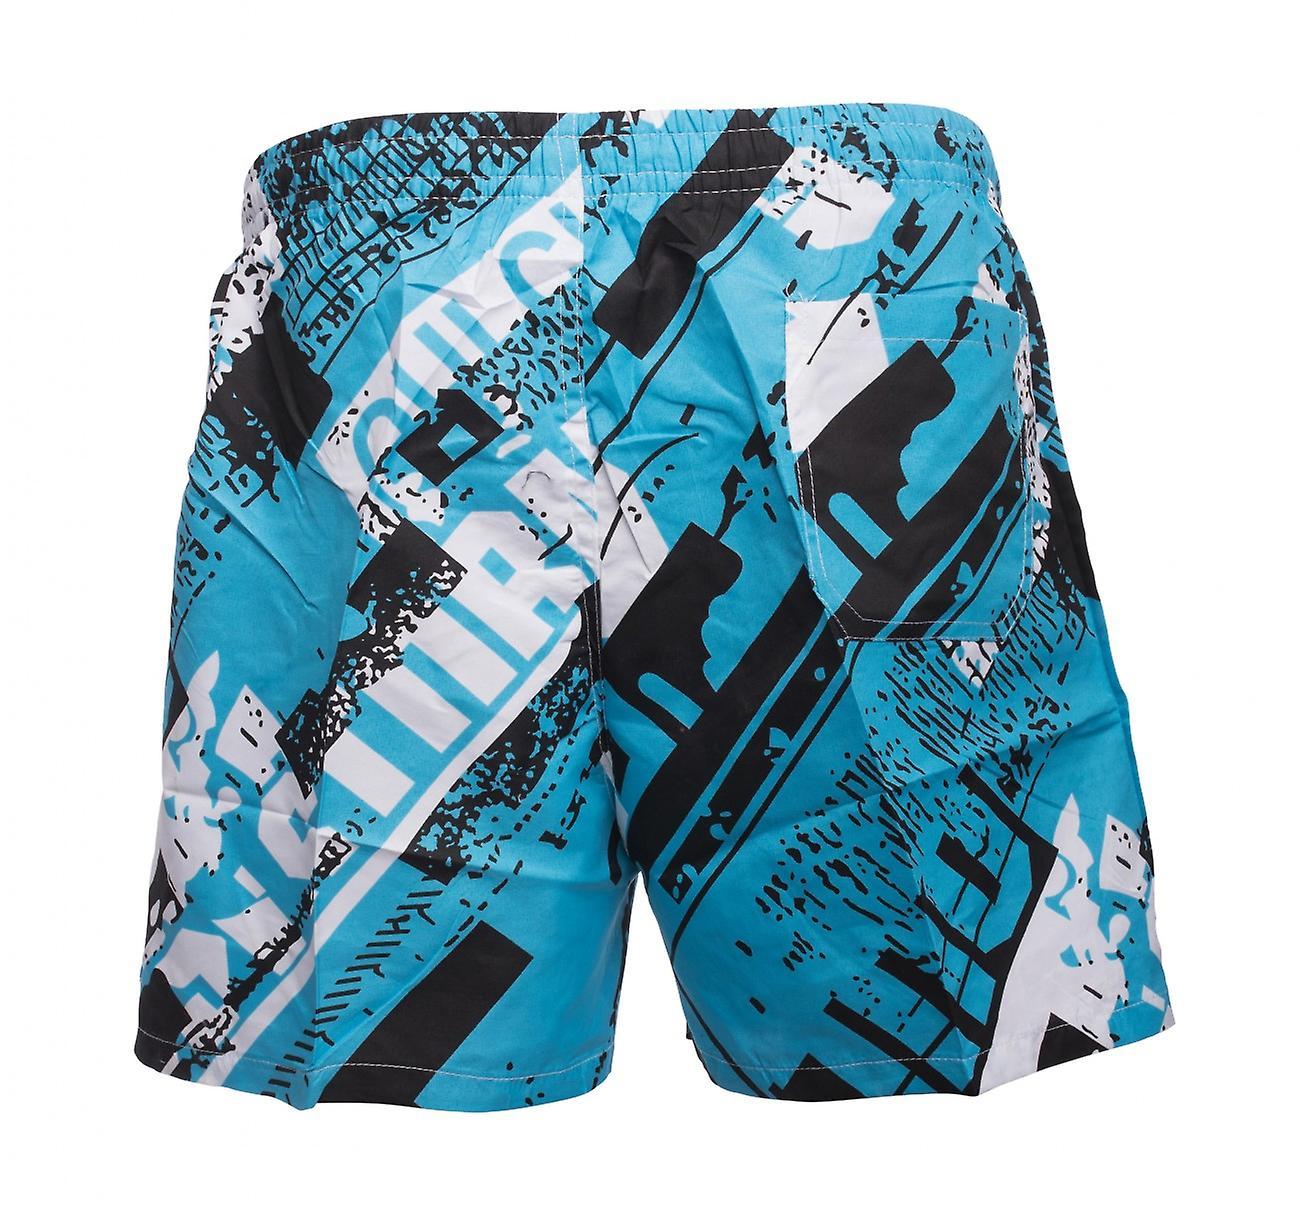 Mens Skater Schwimmen Boardshorts Shorts Badepanty Artwork Print Hosen Fruugo